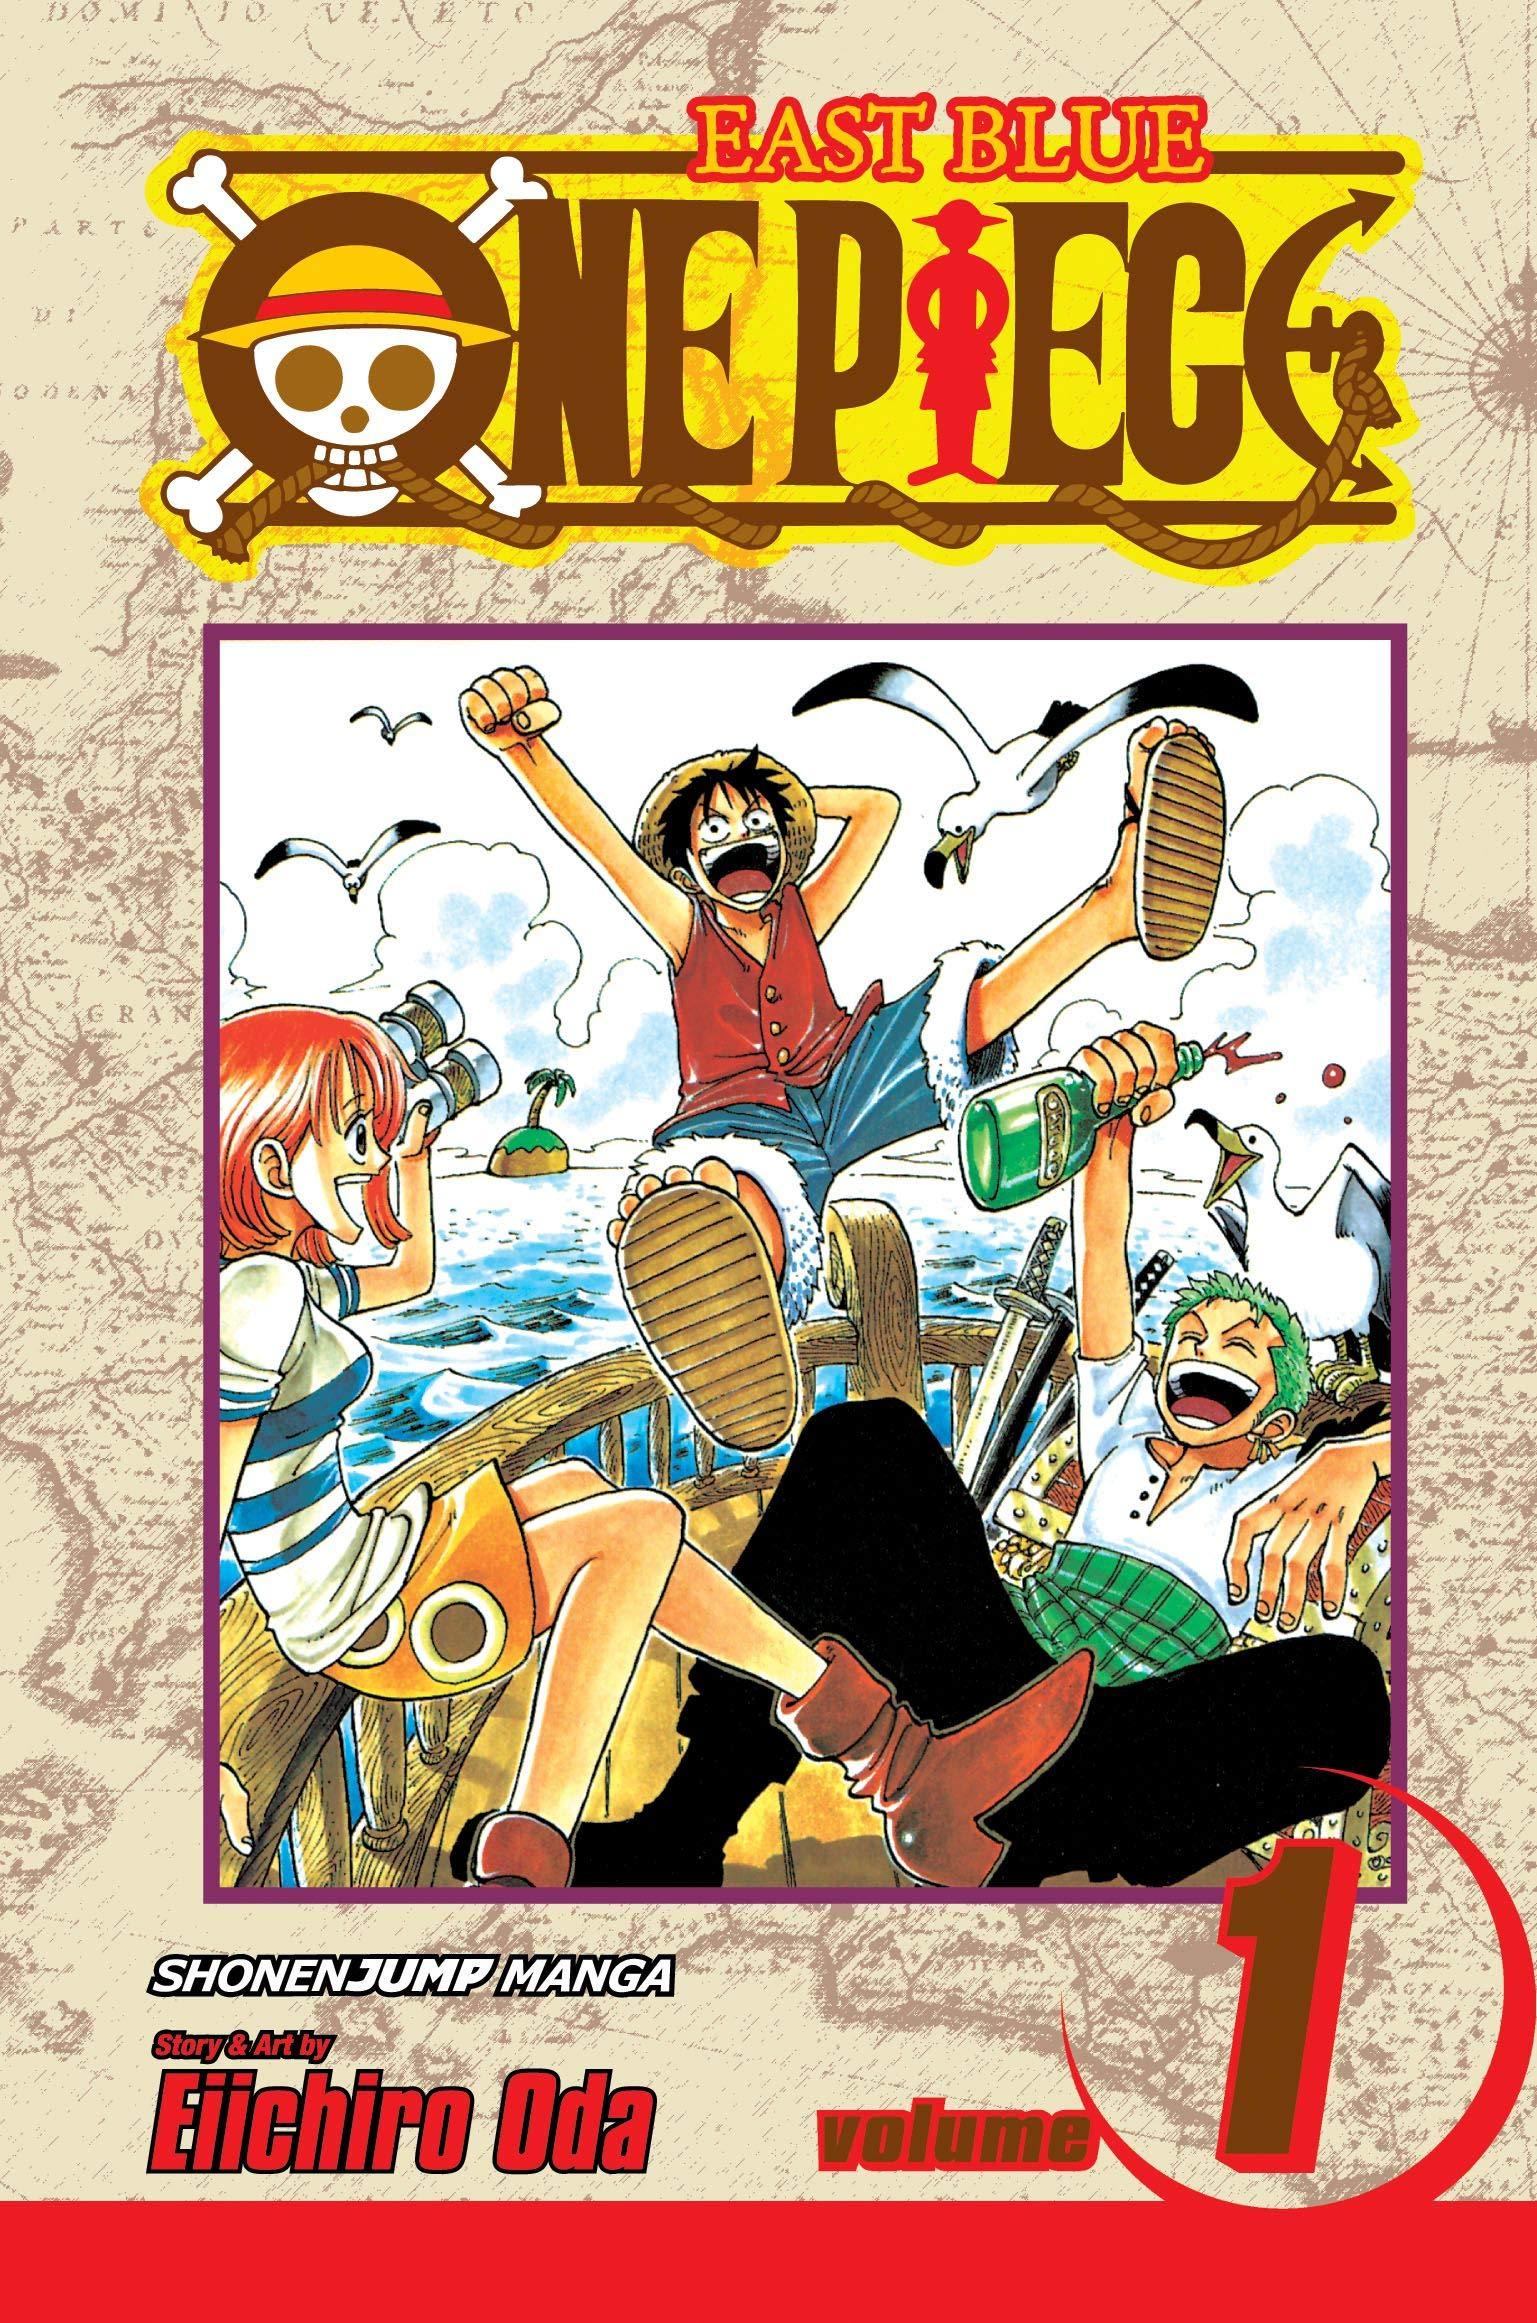 Amazon.com: One Piece, Vol. 1: Romance Dawn (0782009136637): Oda, Eiichiro,  Oda, Eiichiro: Books